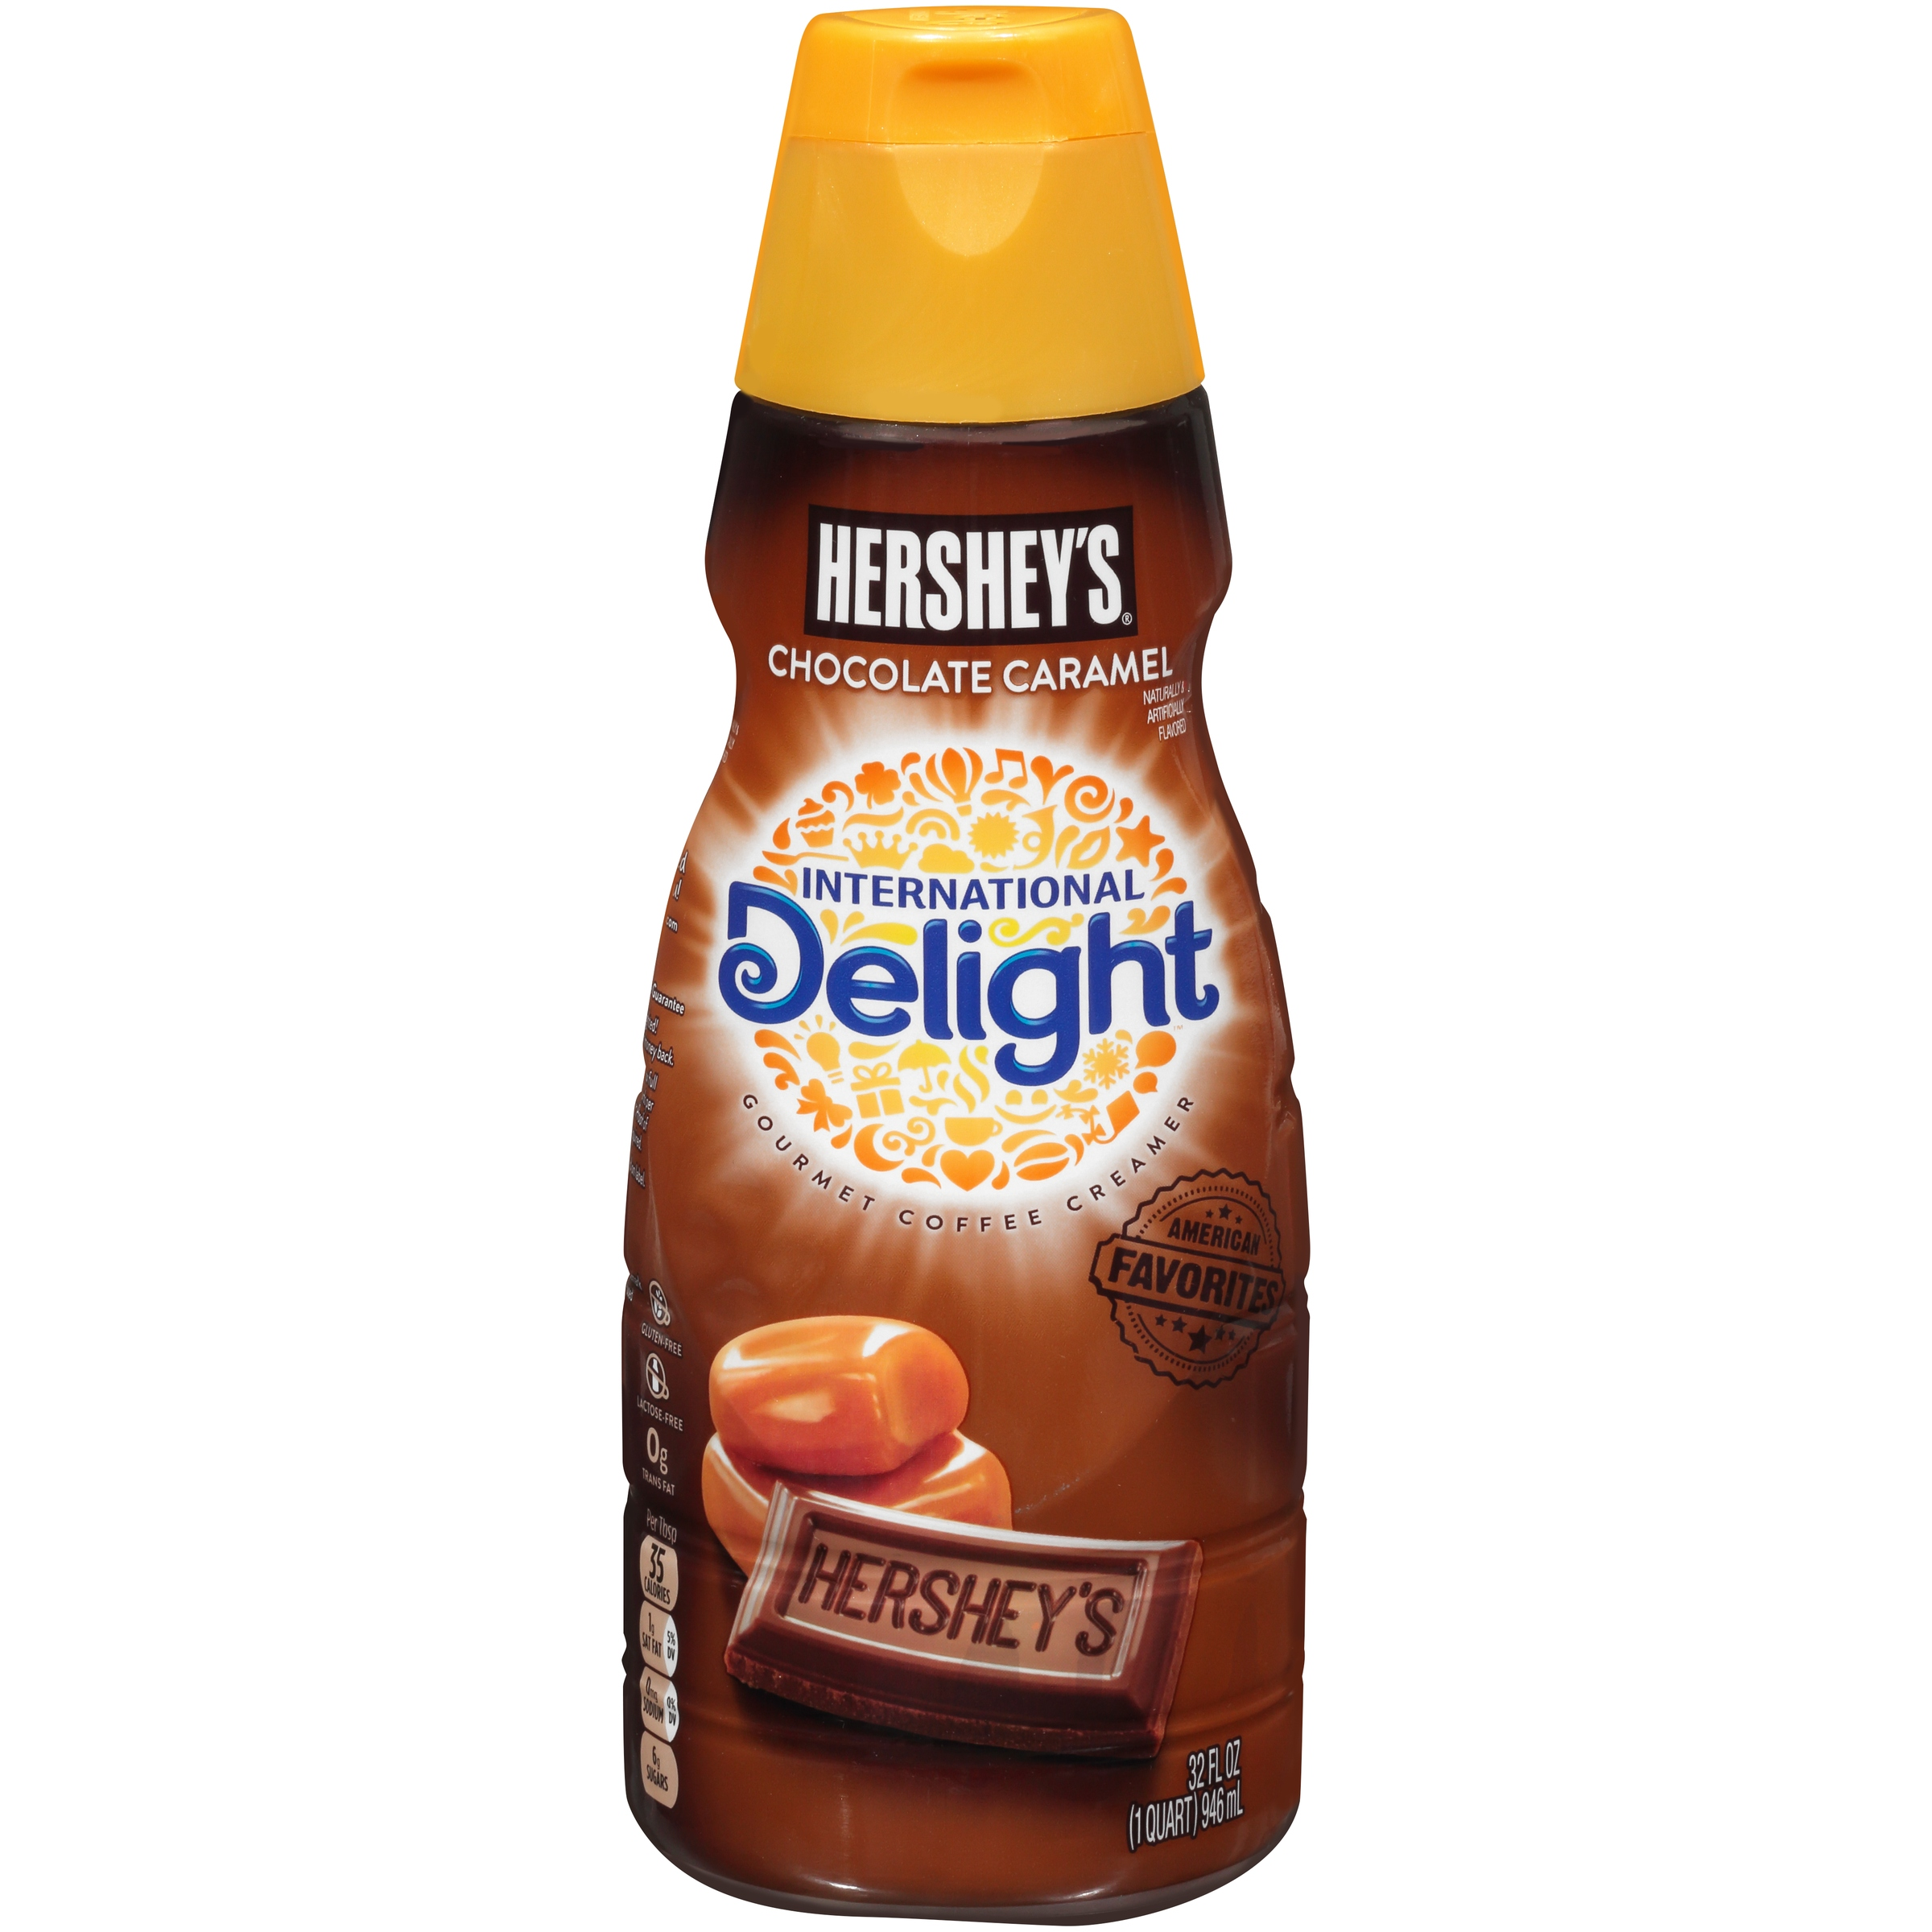 International Delight Hershey's Chocolate Caramel Coffee Creamer ...